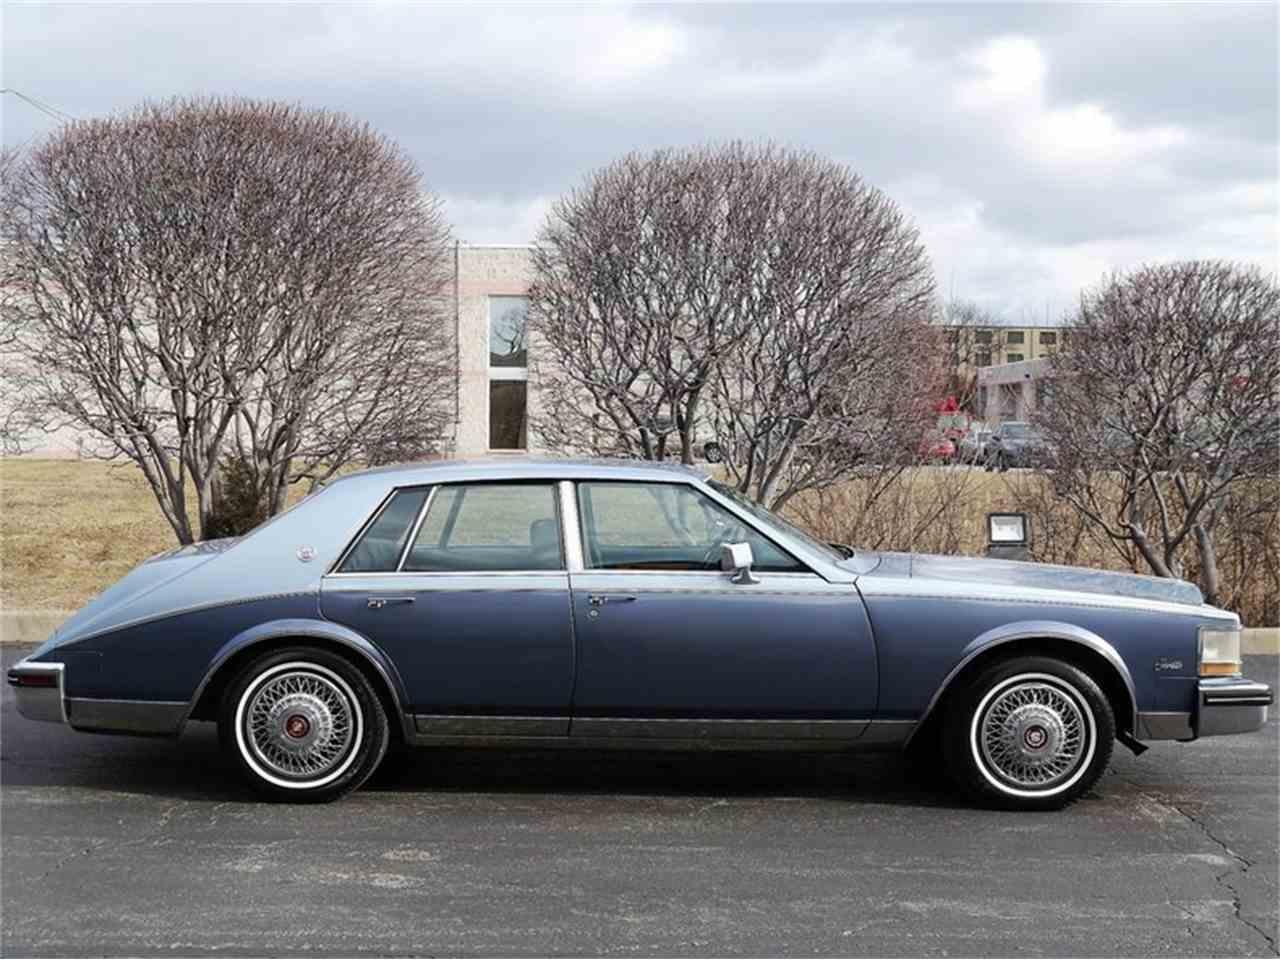 1985 Cadillac Seville for Sale | ClassicCars.com | CC-1008458 | 1280 x 960 jpeg 102kB